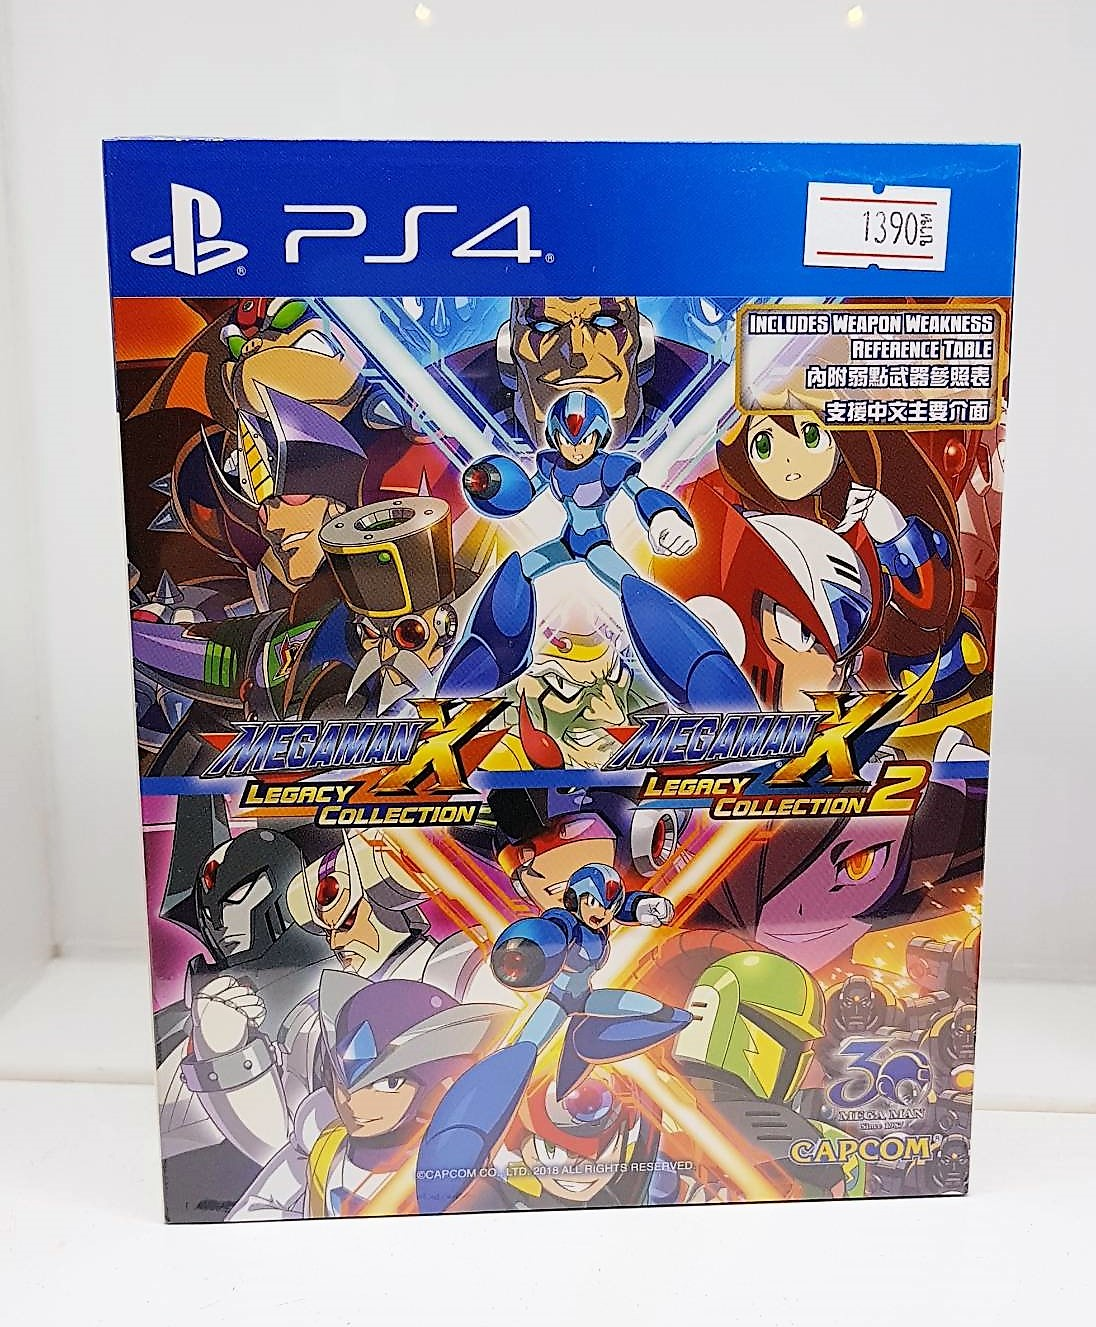 PS4: Mega Man X Legacy Collection 1+2 (R3)